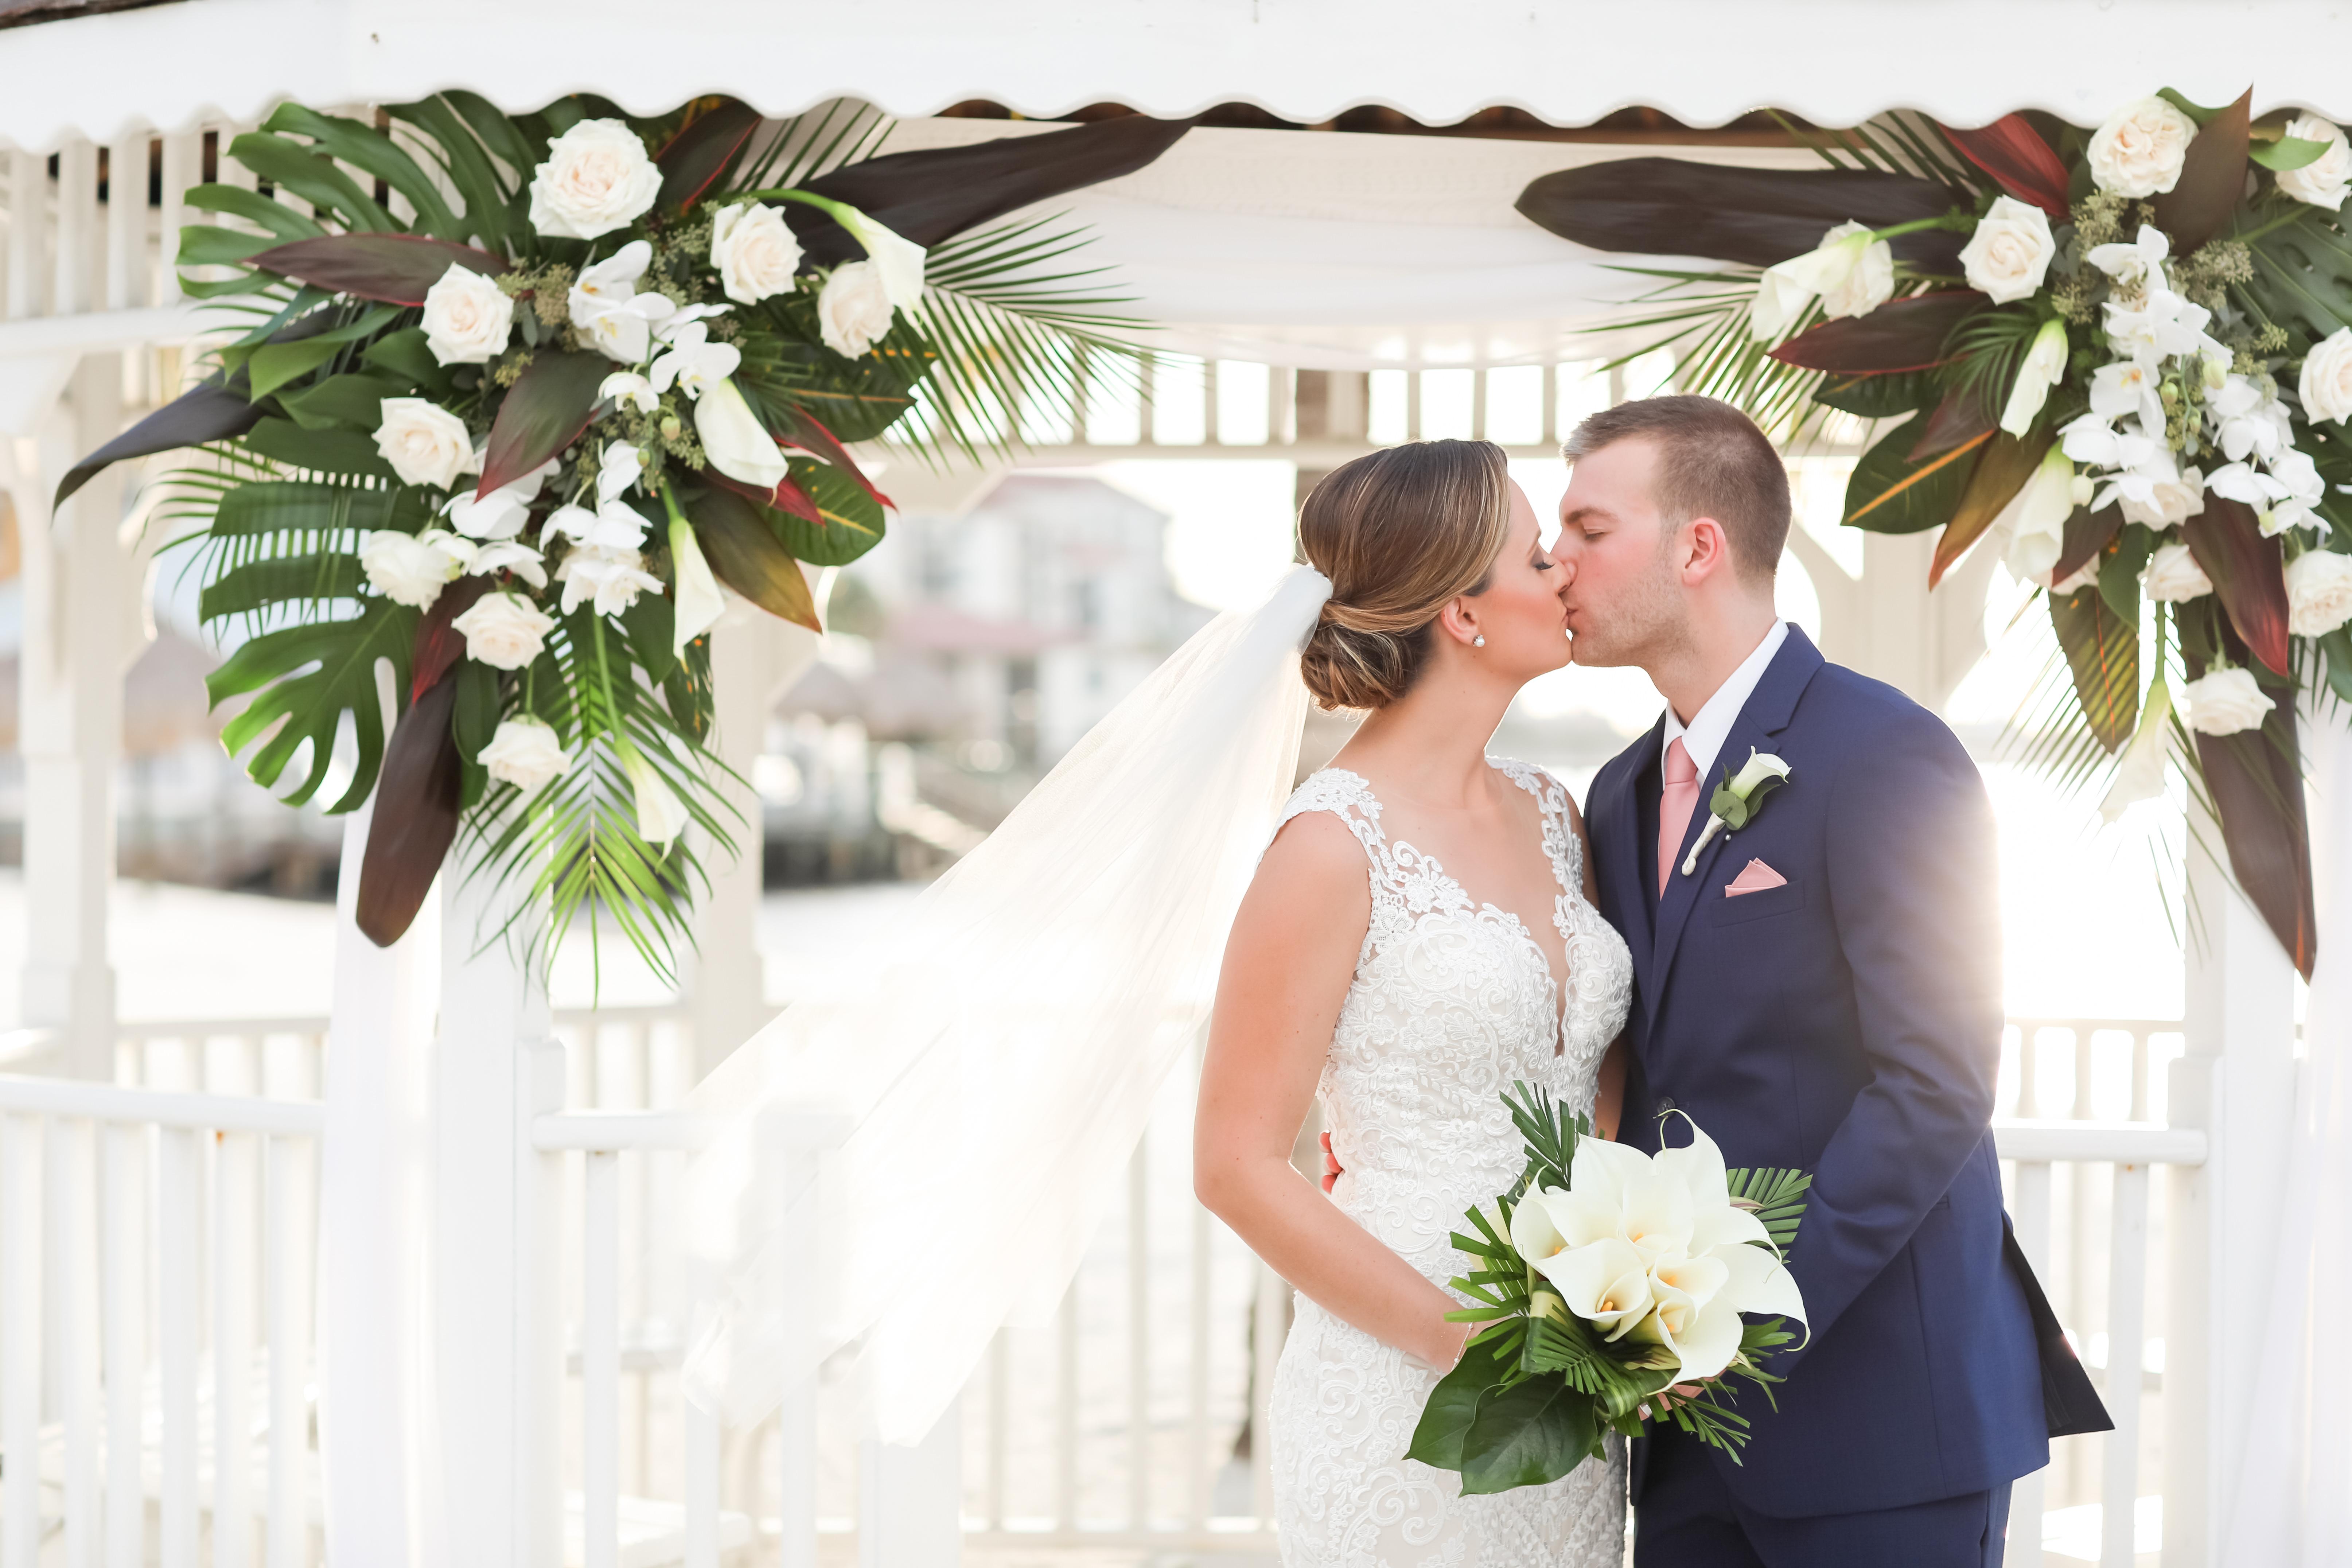 Florida Bride and Groom Intimate Beach Elegant Sunset Wedding Portrait at Waterfront Gazebo | Photographer LifeLong Photography Studios | St. Pete Beach Wedding Venue Isla Del Sol Yacht and Country Club